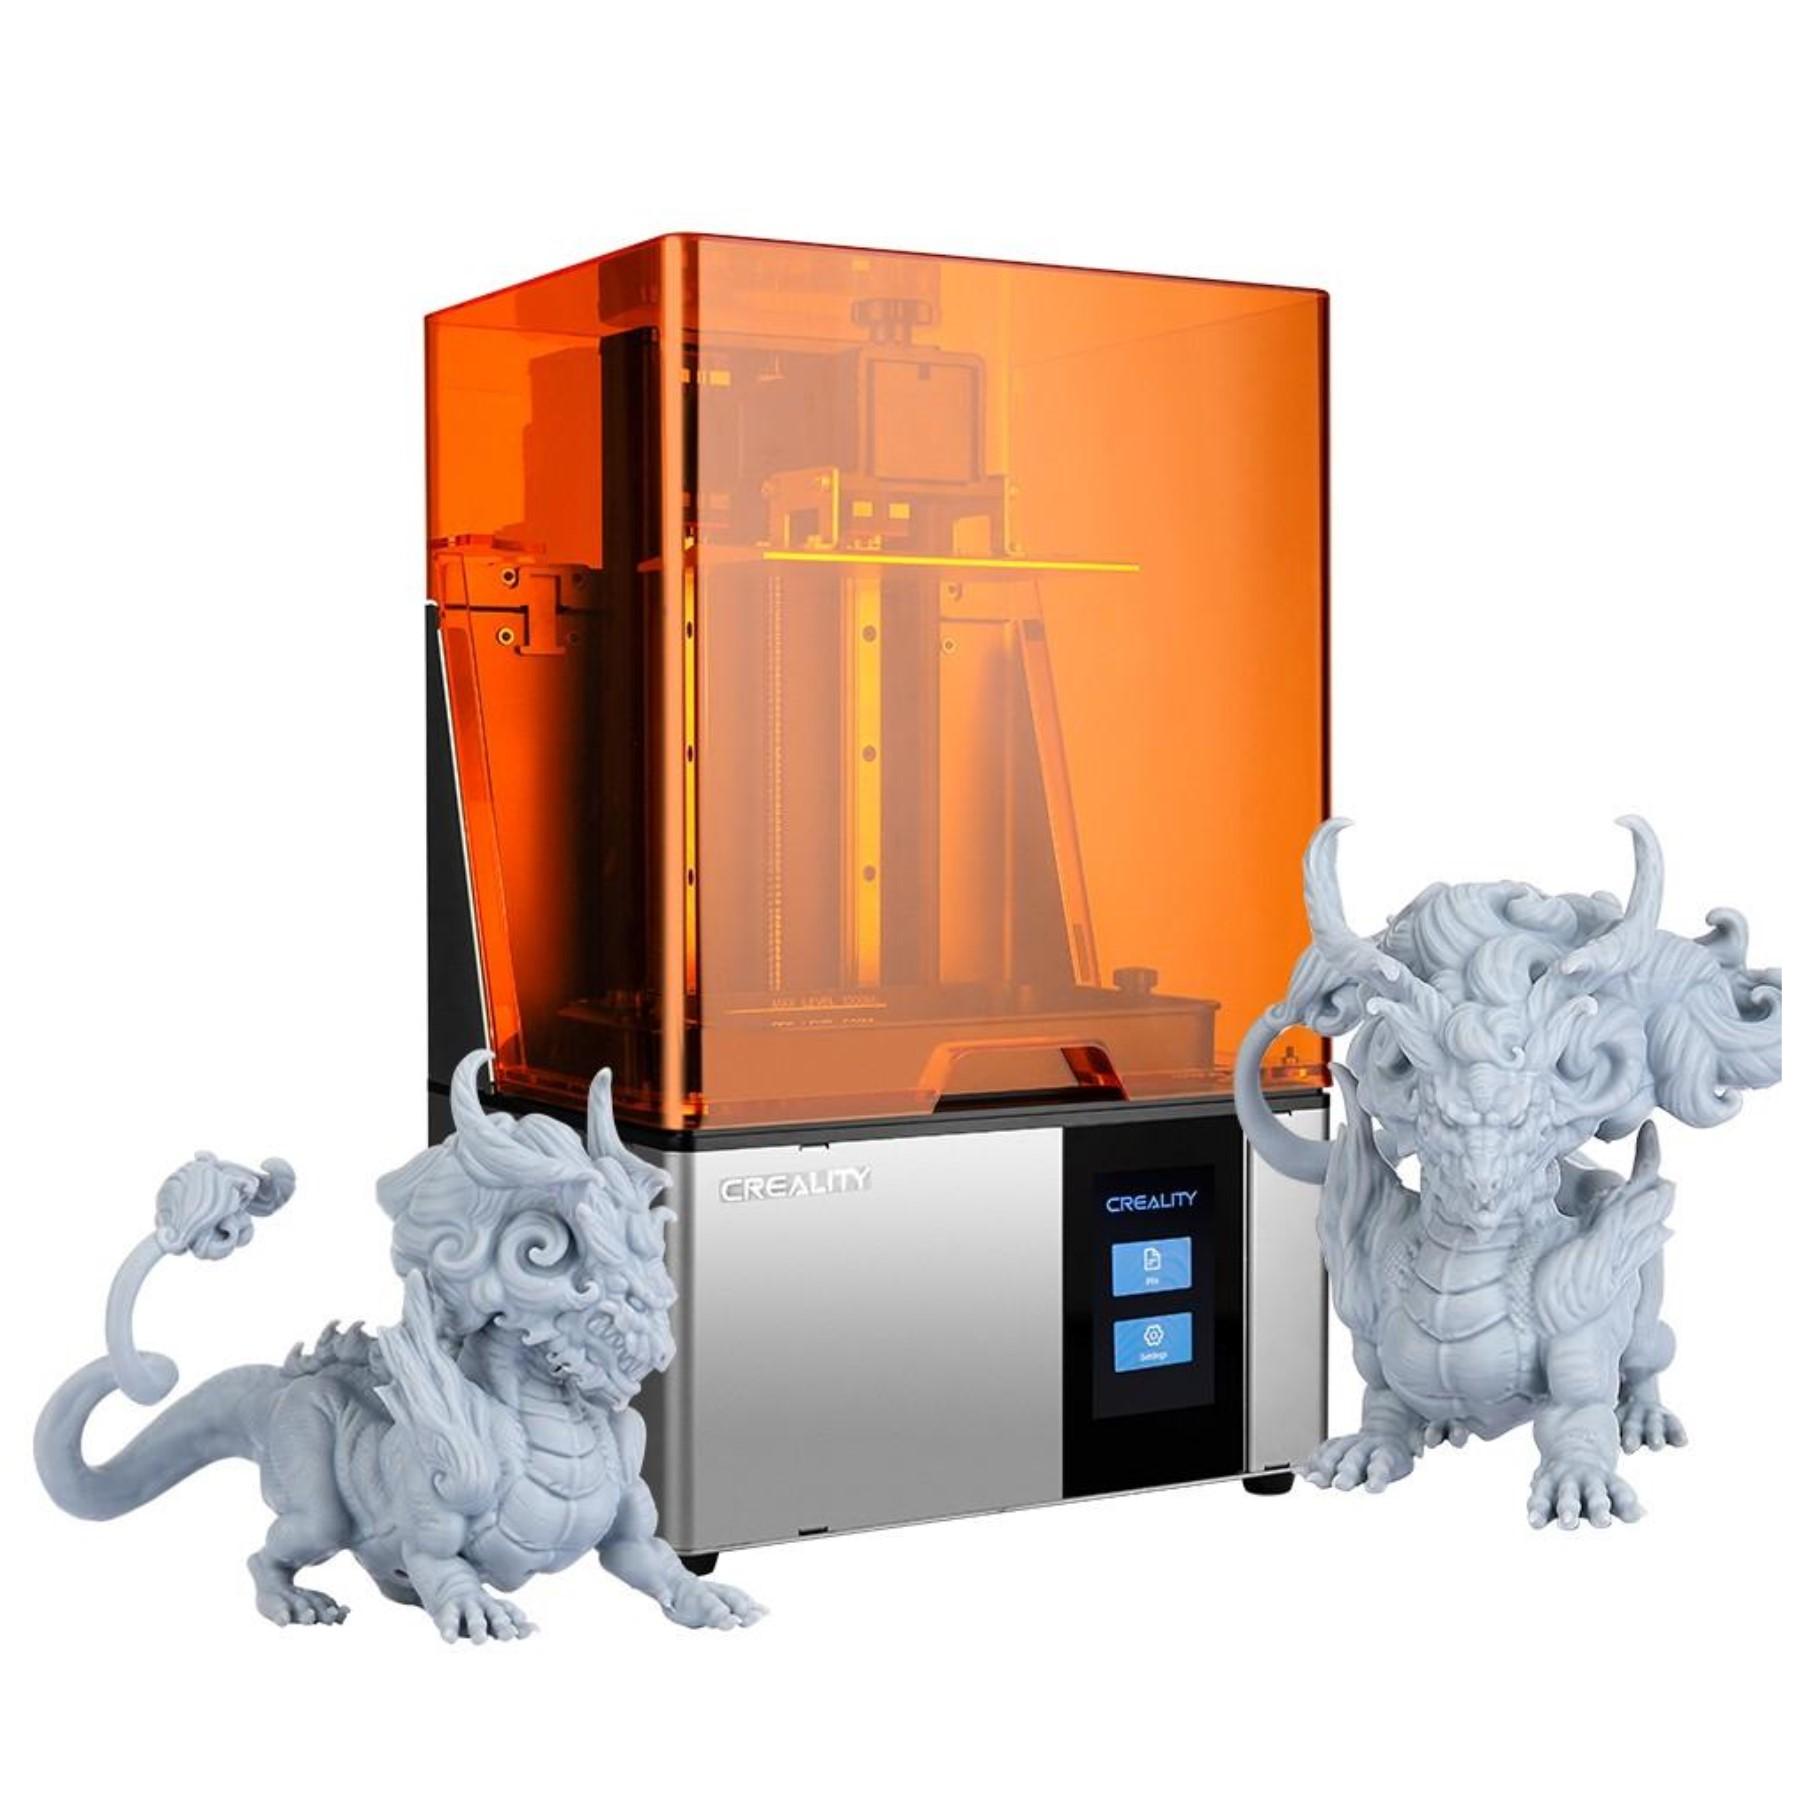 Impresora 3D de Resina HALOT-SKY CL-89